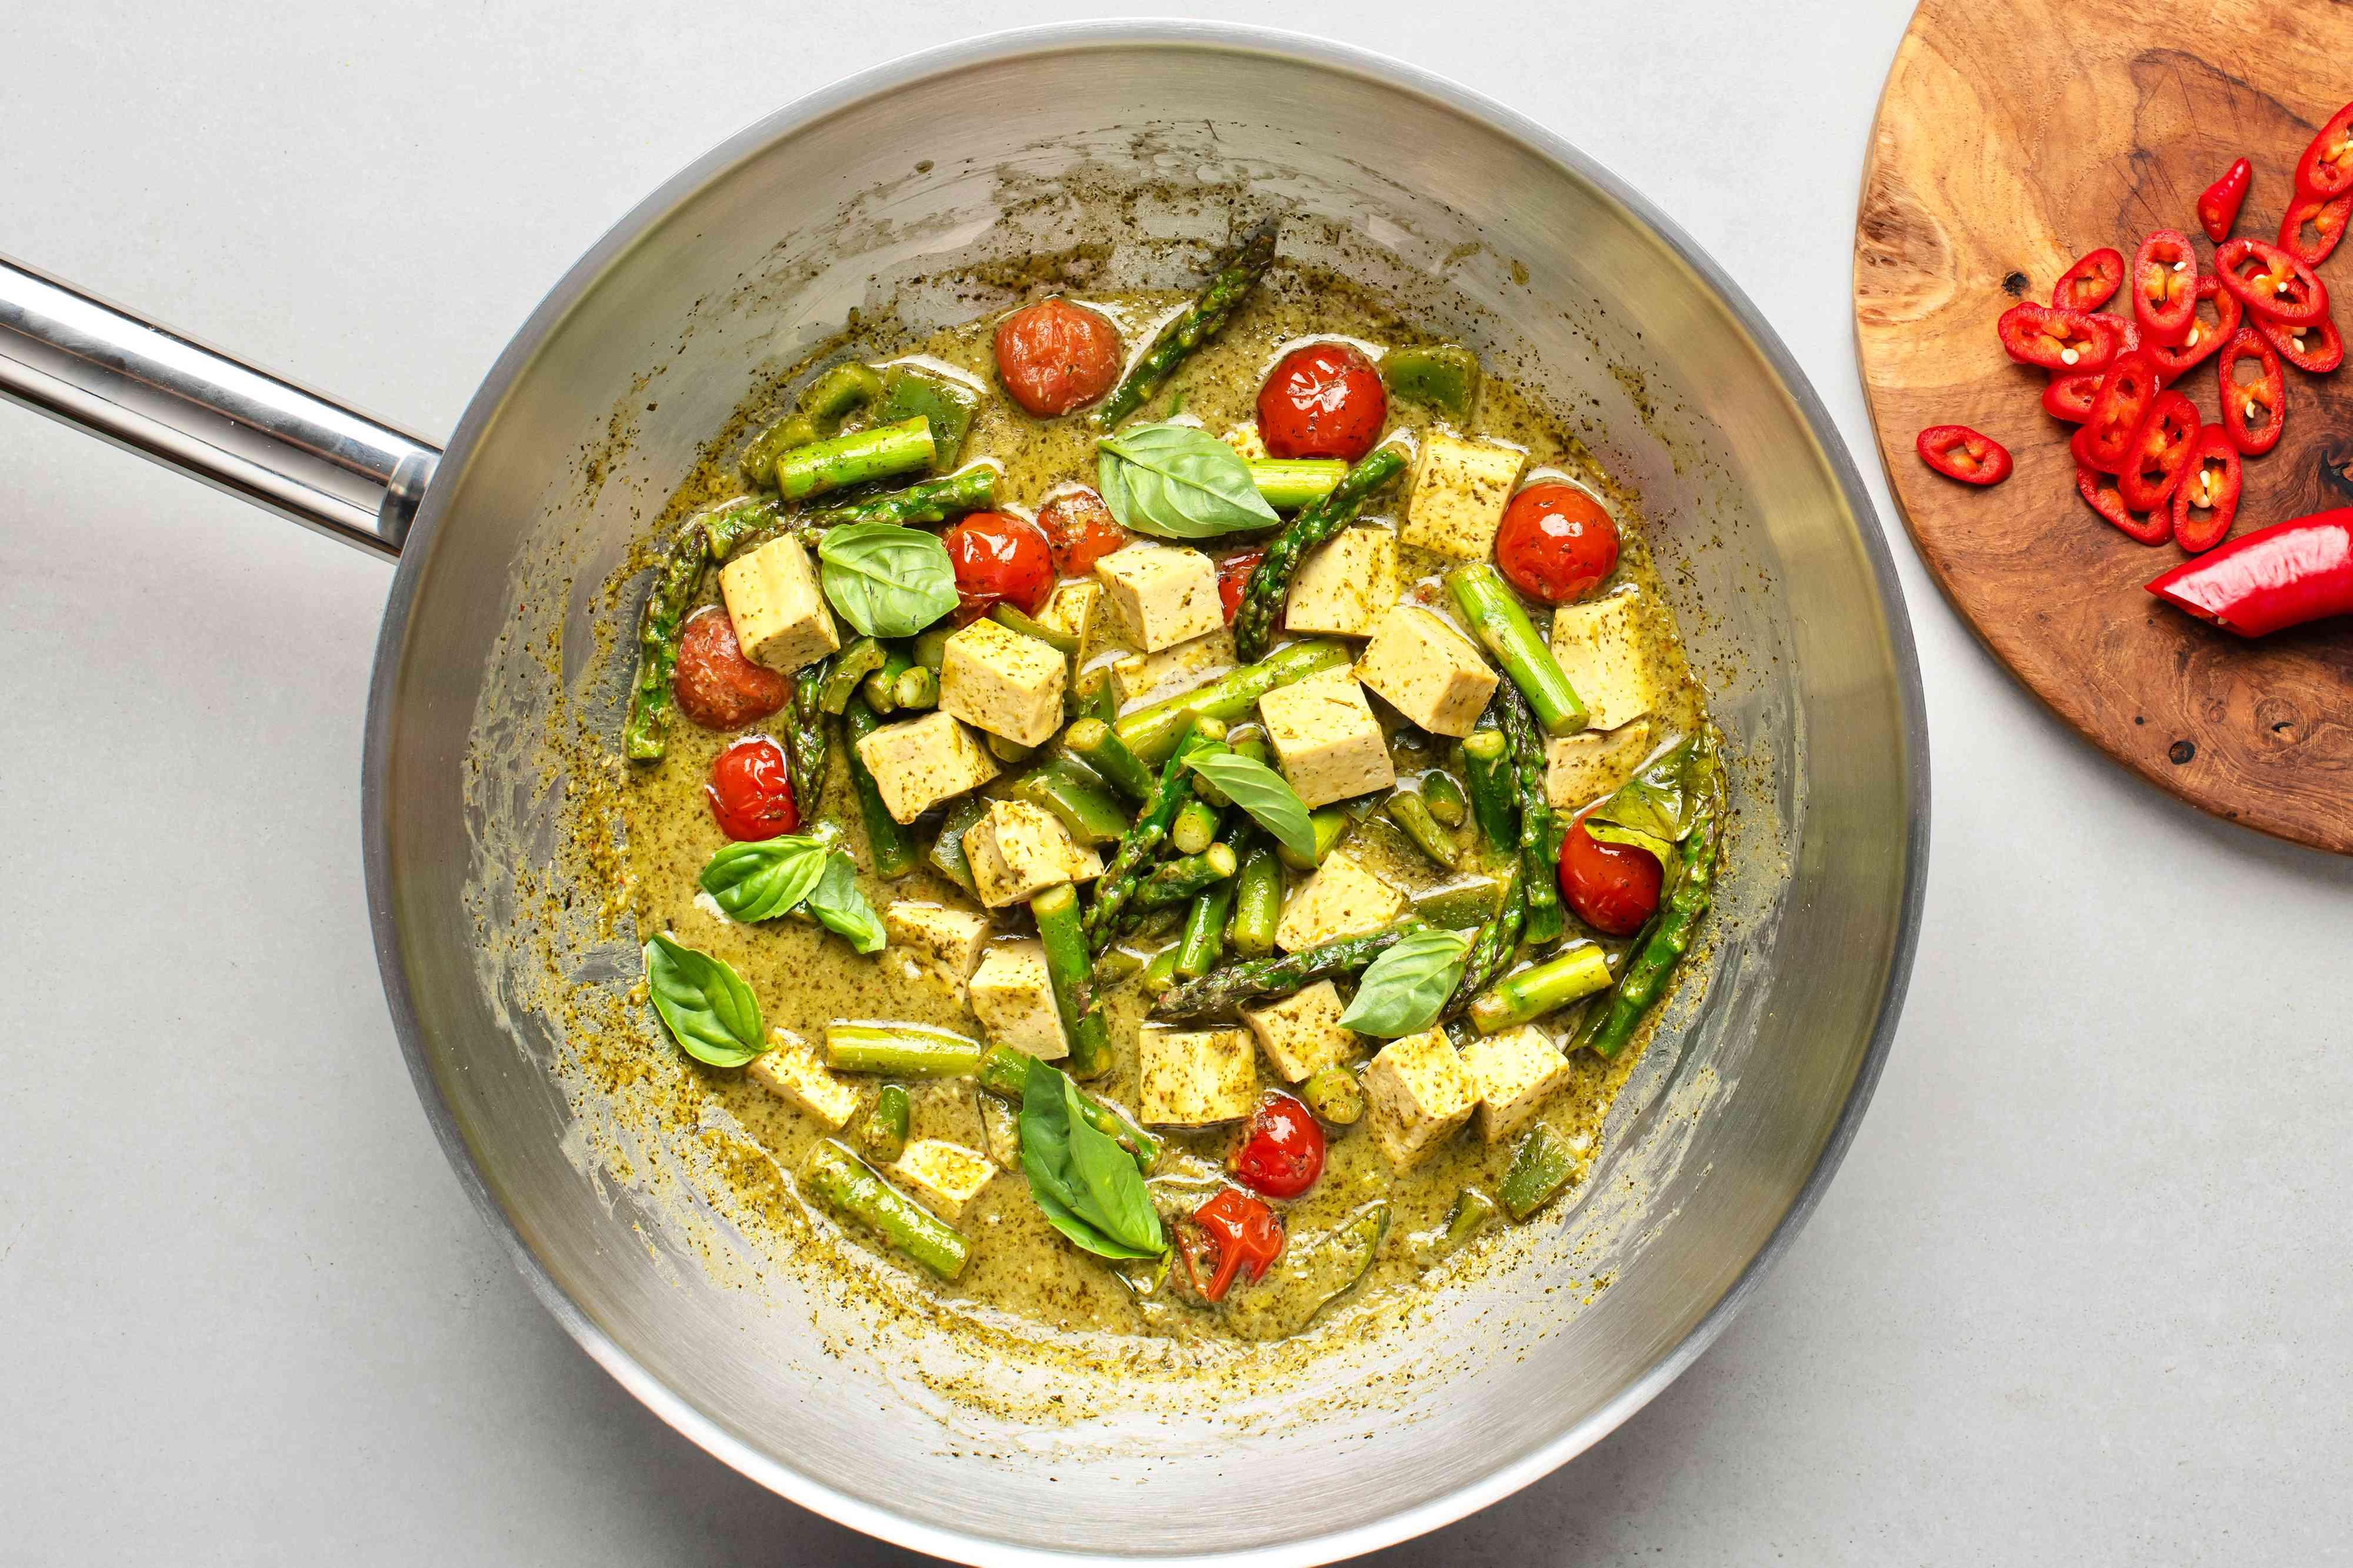 Vegetarian Thai Green Coconut Curry in a wok